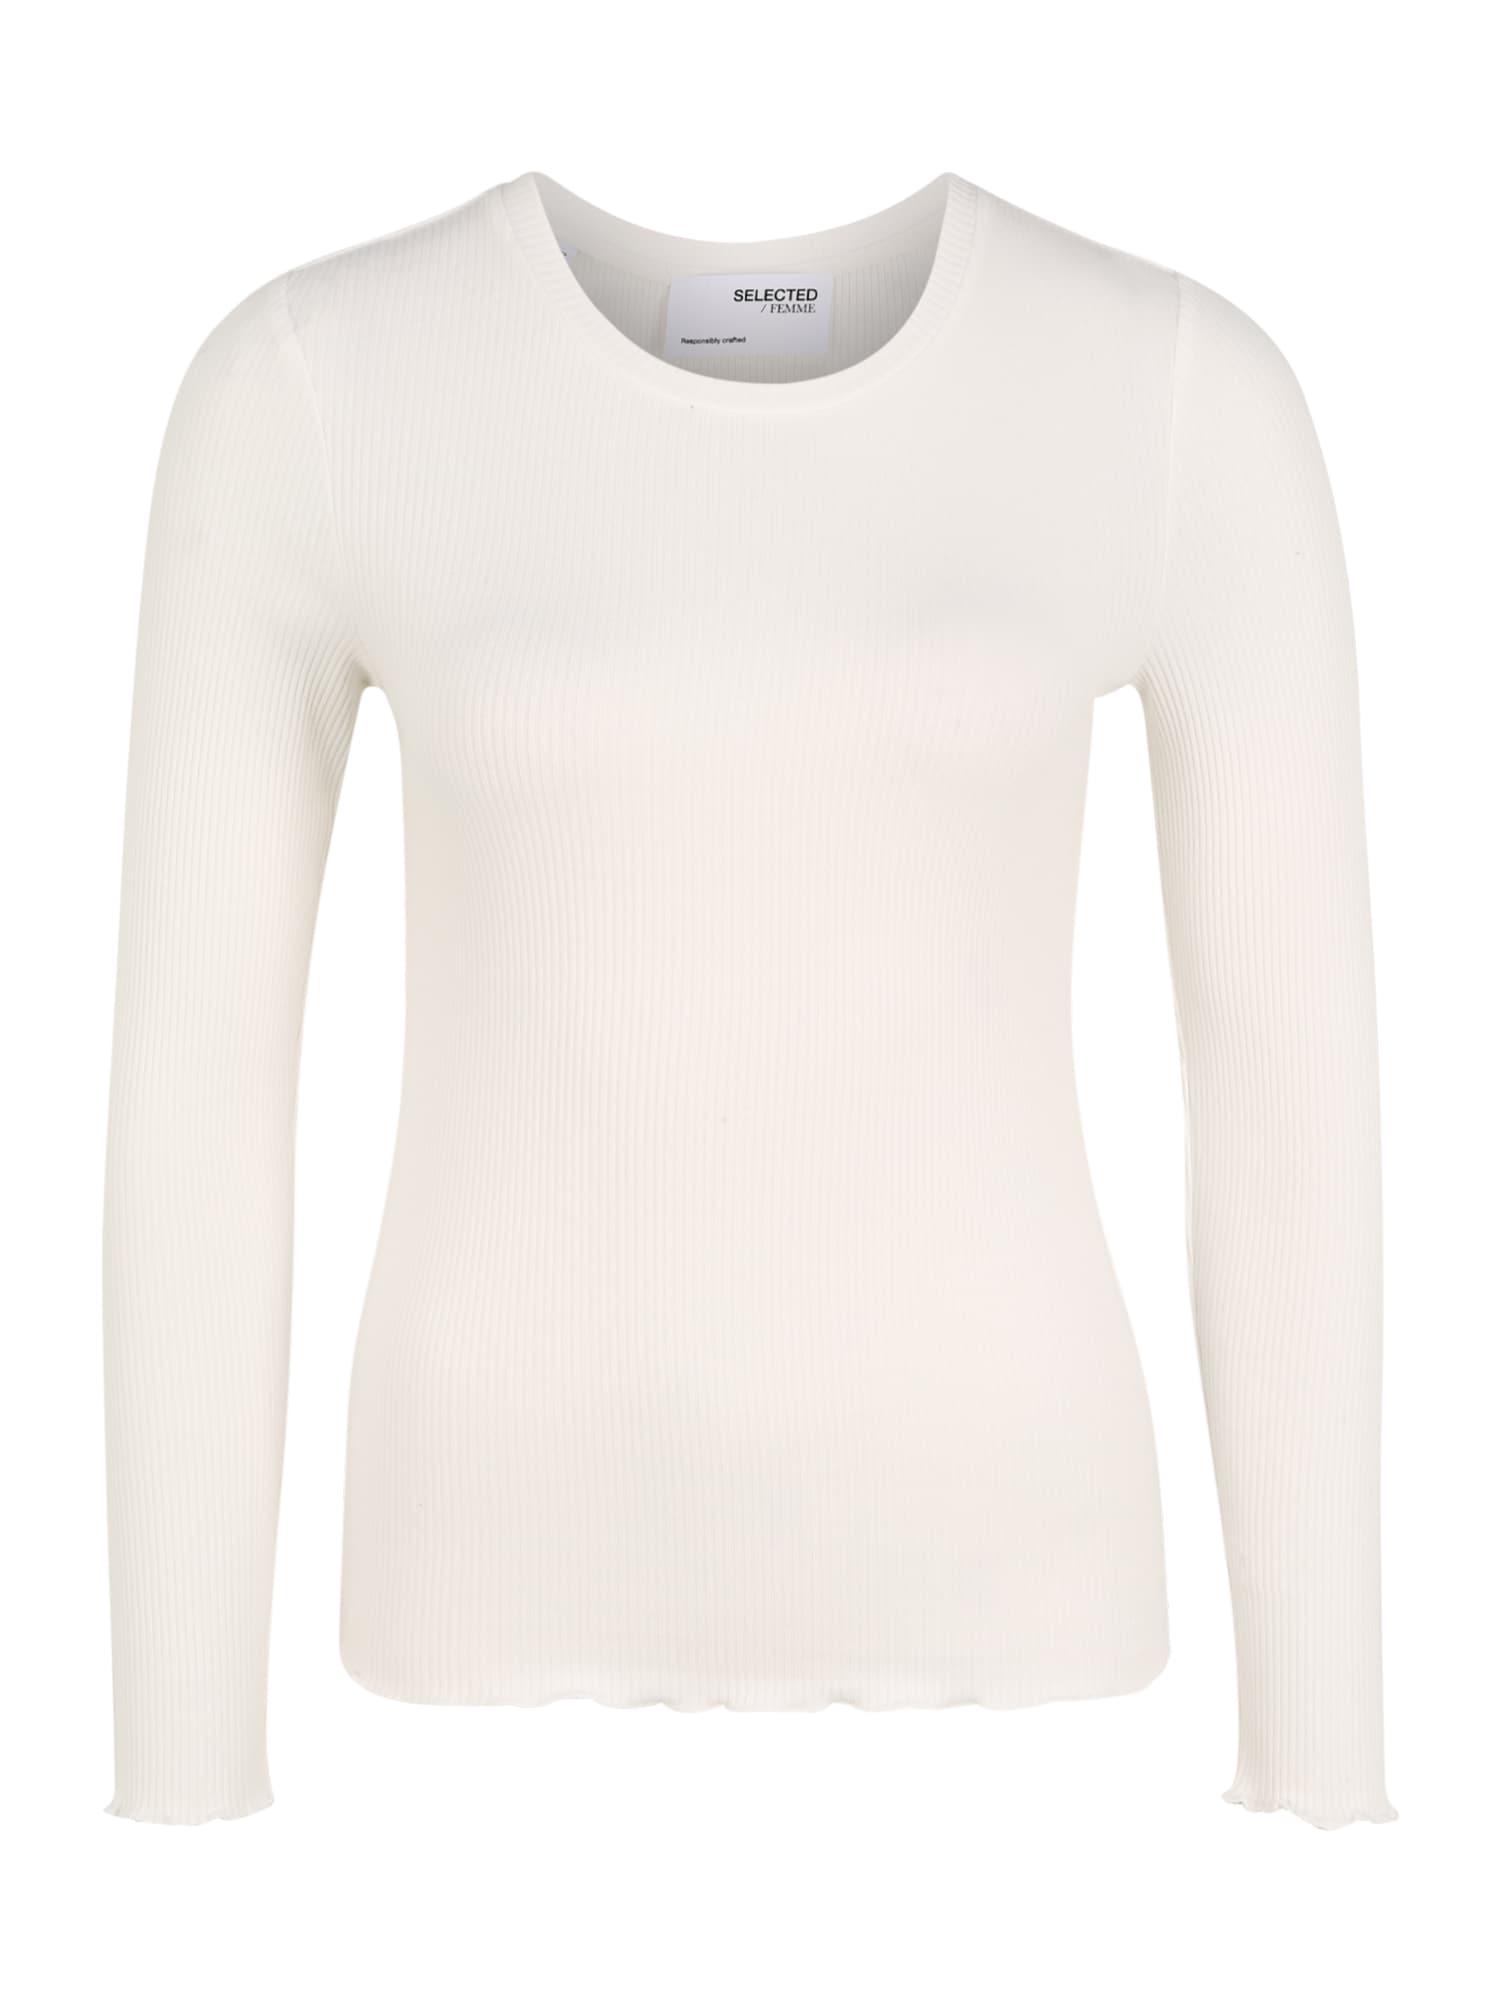 Selected Femme (Petite) Marškinėliai balta